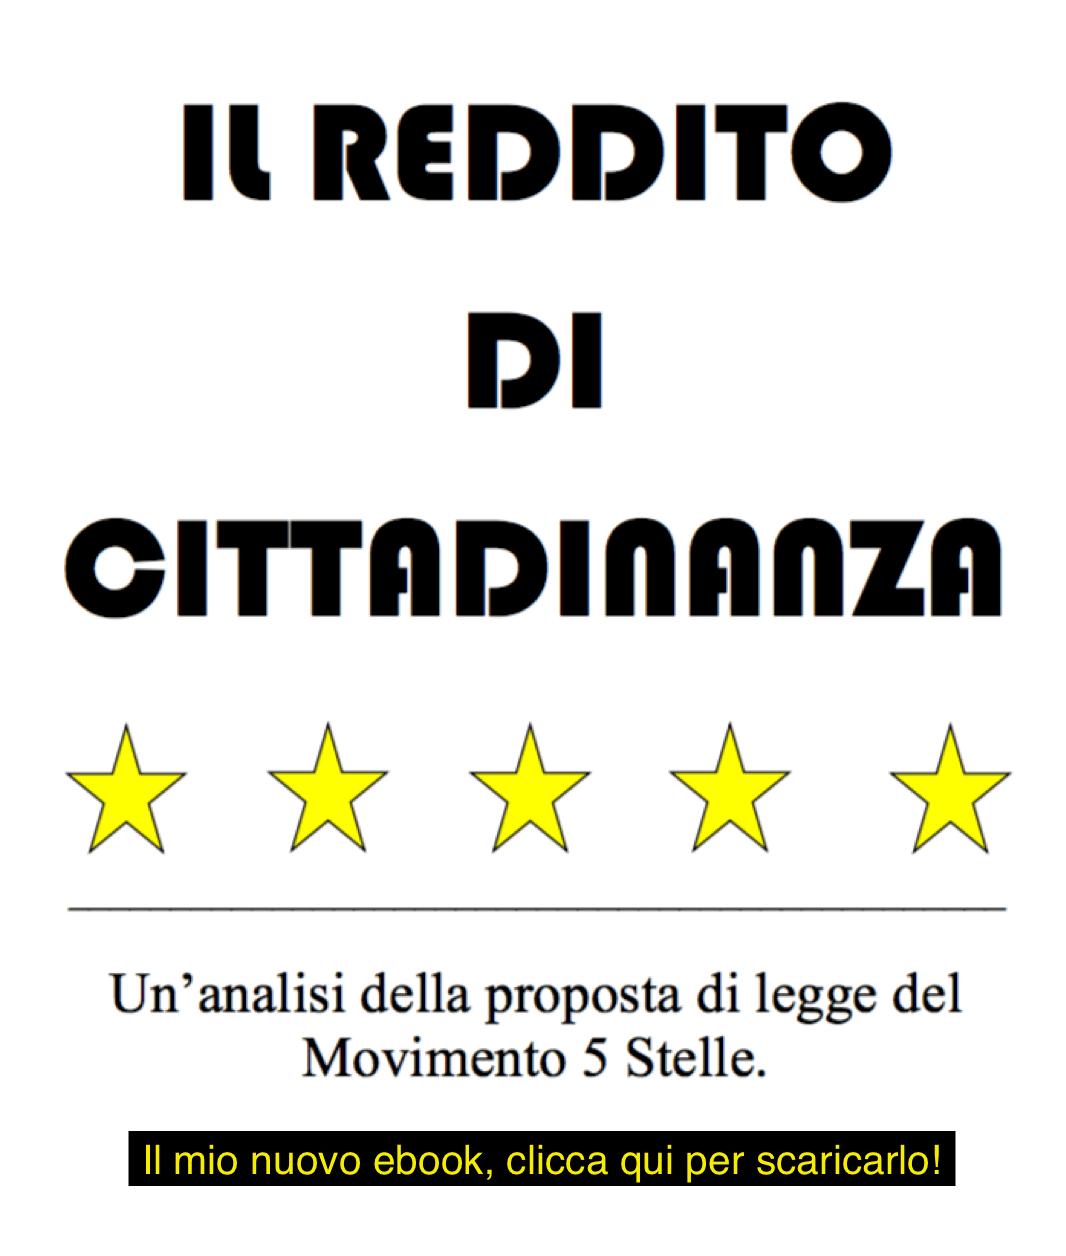 e-book reddito cittadinanza simone fontana